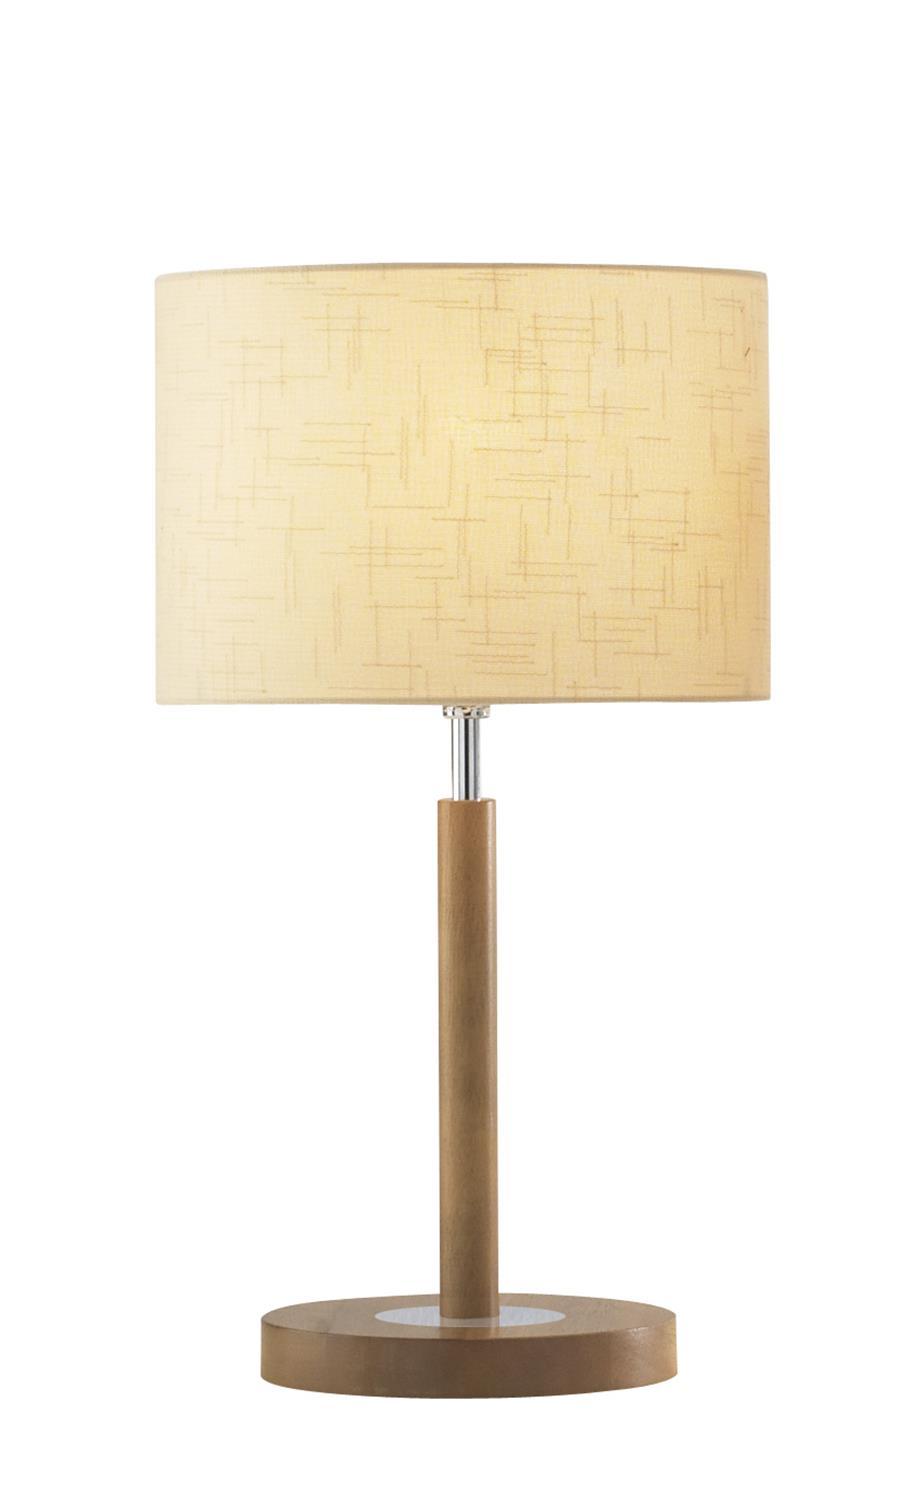 ave4043 avenue table lamp in wood including shade lighting bug swindon. Black Bedroom Furniture Sets. Home Design Ideas